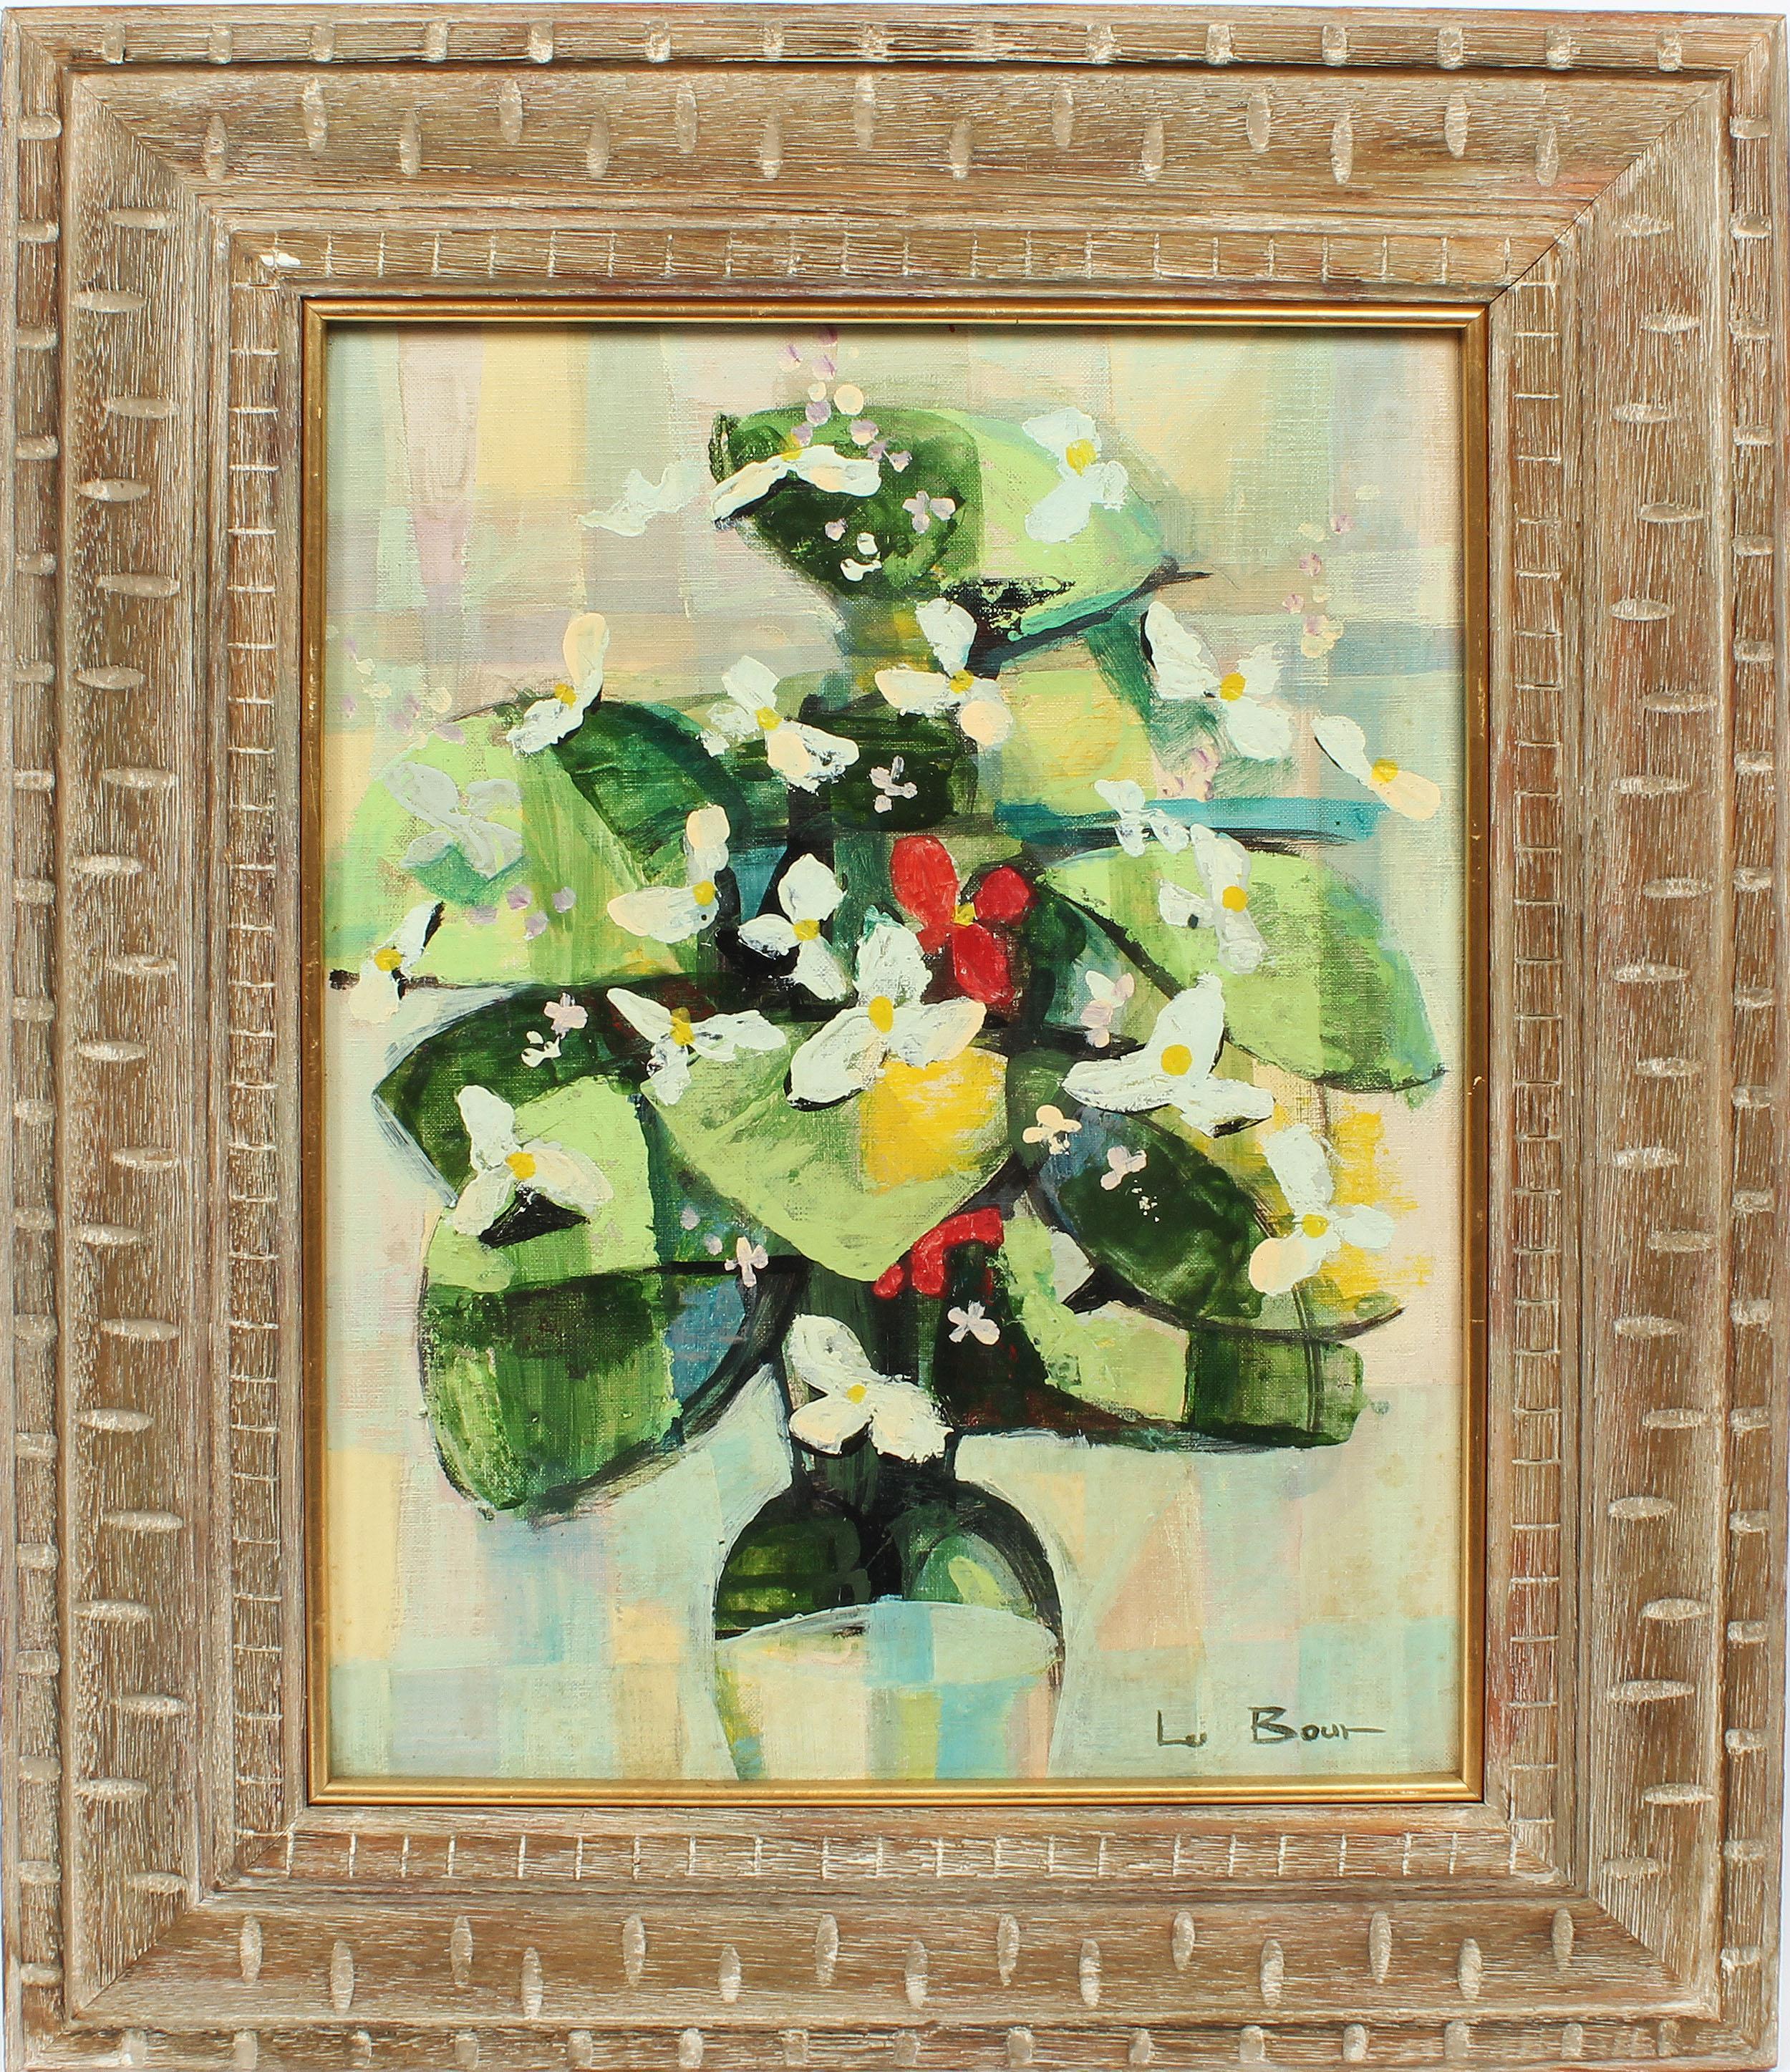 Antique Paris Modern Abstract Flower Still Life Signed Original Oil Painting